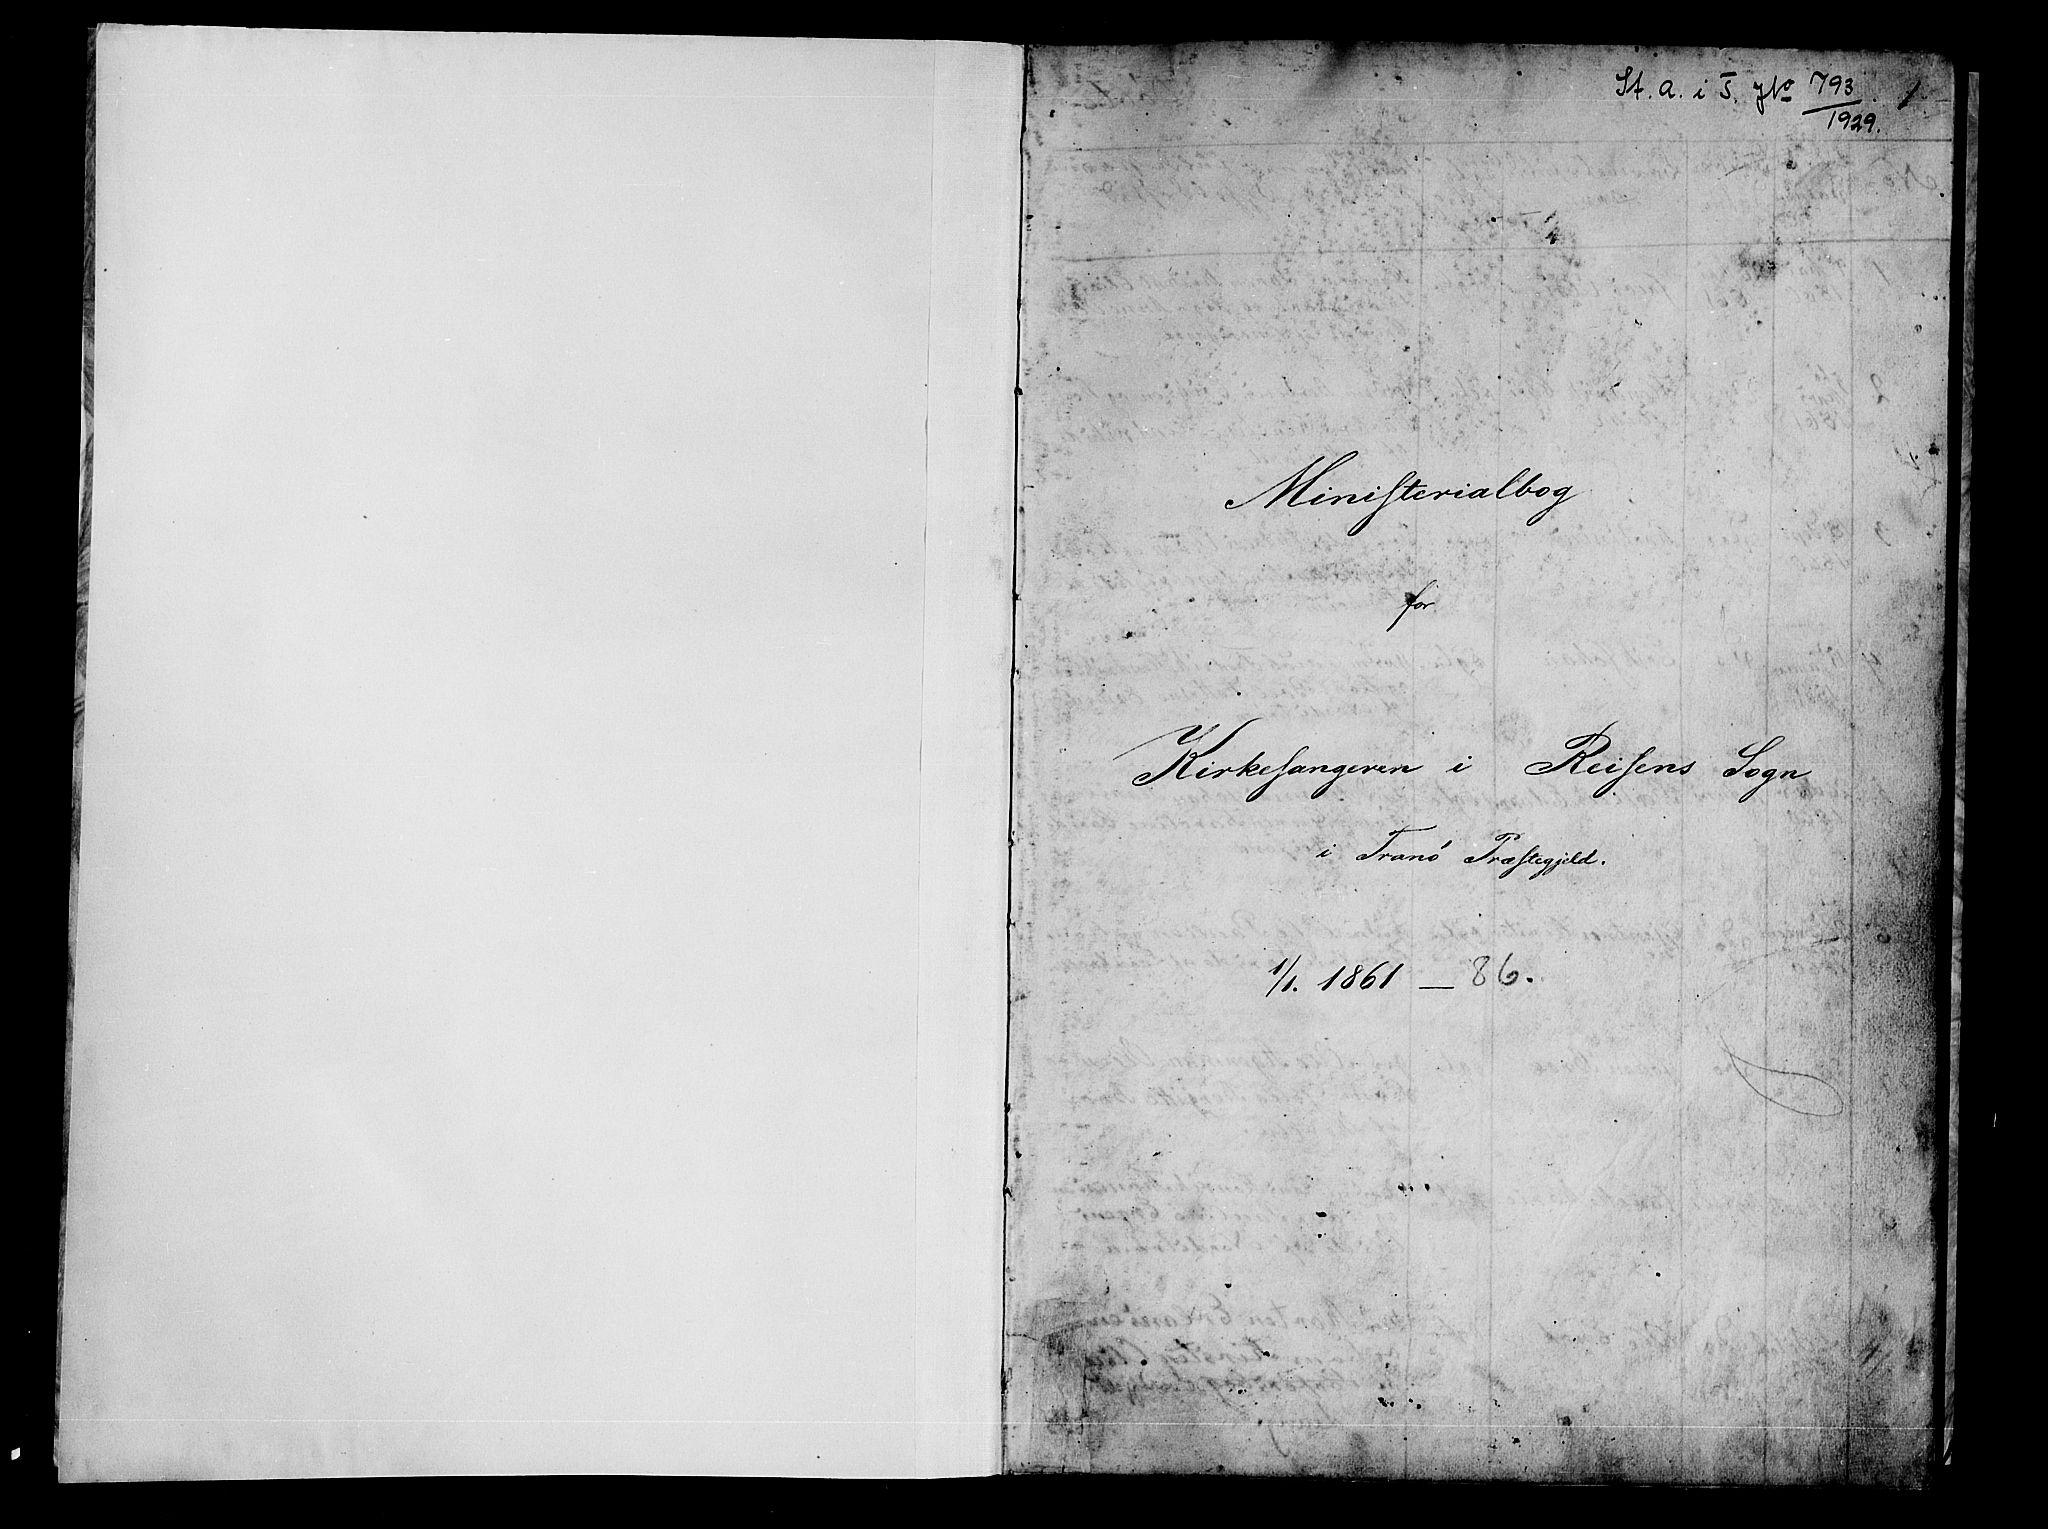 SATØ, Tranøy sokneprestkontor, I/Ia/Iab/L0021klokker: Klokkerbok nr. 21, 1861-1886, s. 1